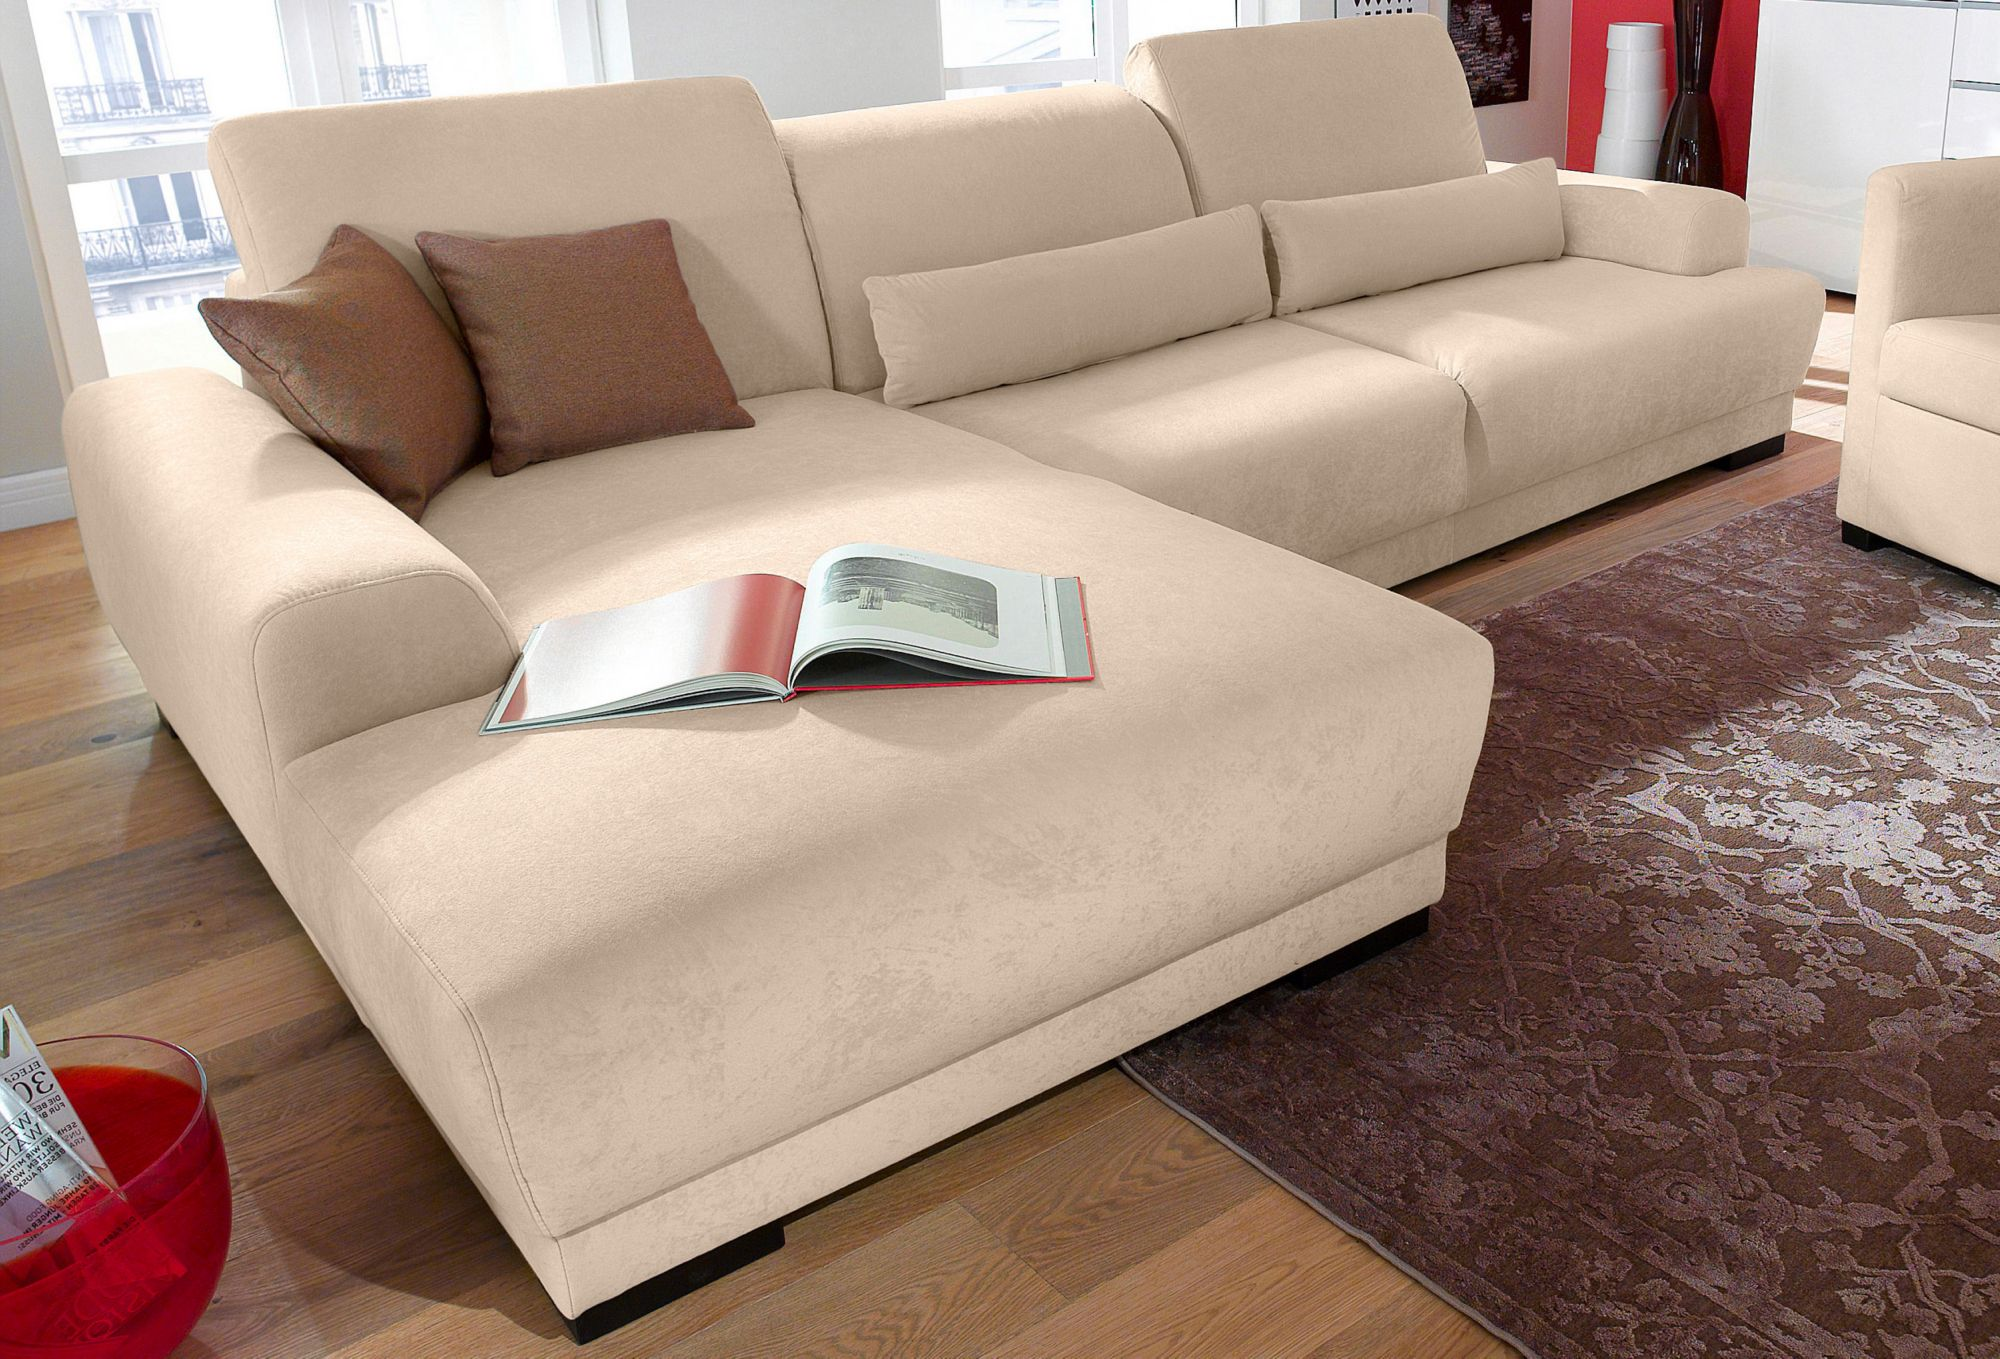 polsterecke wahlweise mit boxspring unterbau schwab versand boxspringsofas. Black Bedroom Furniture Sets. Home Design Ideas